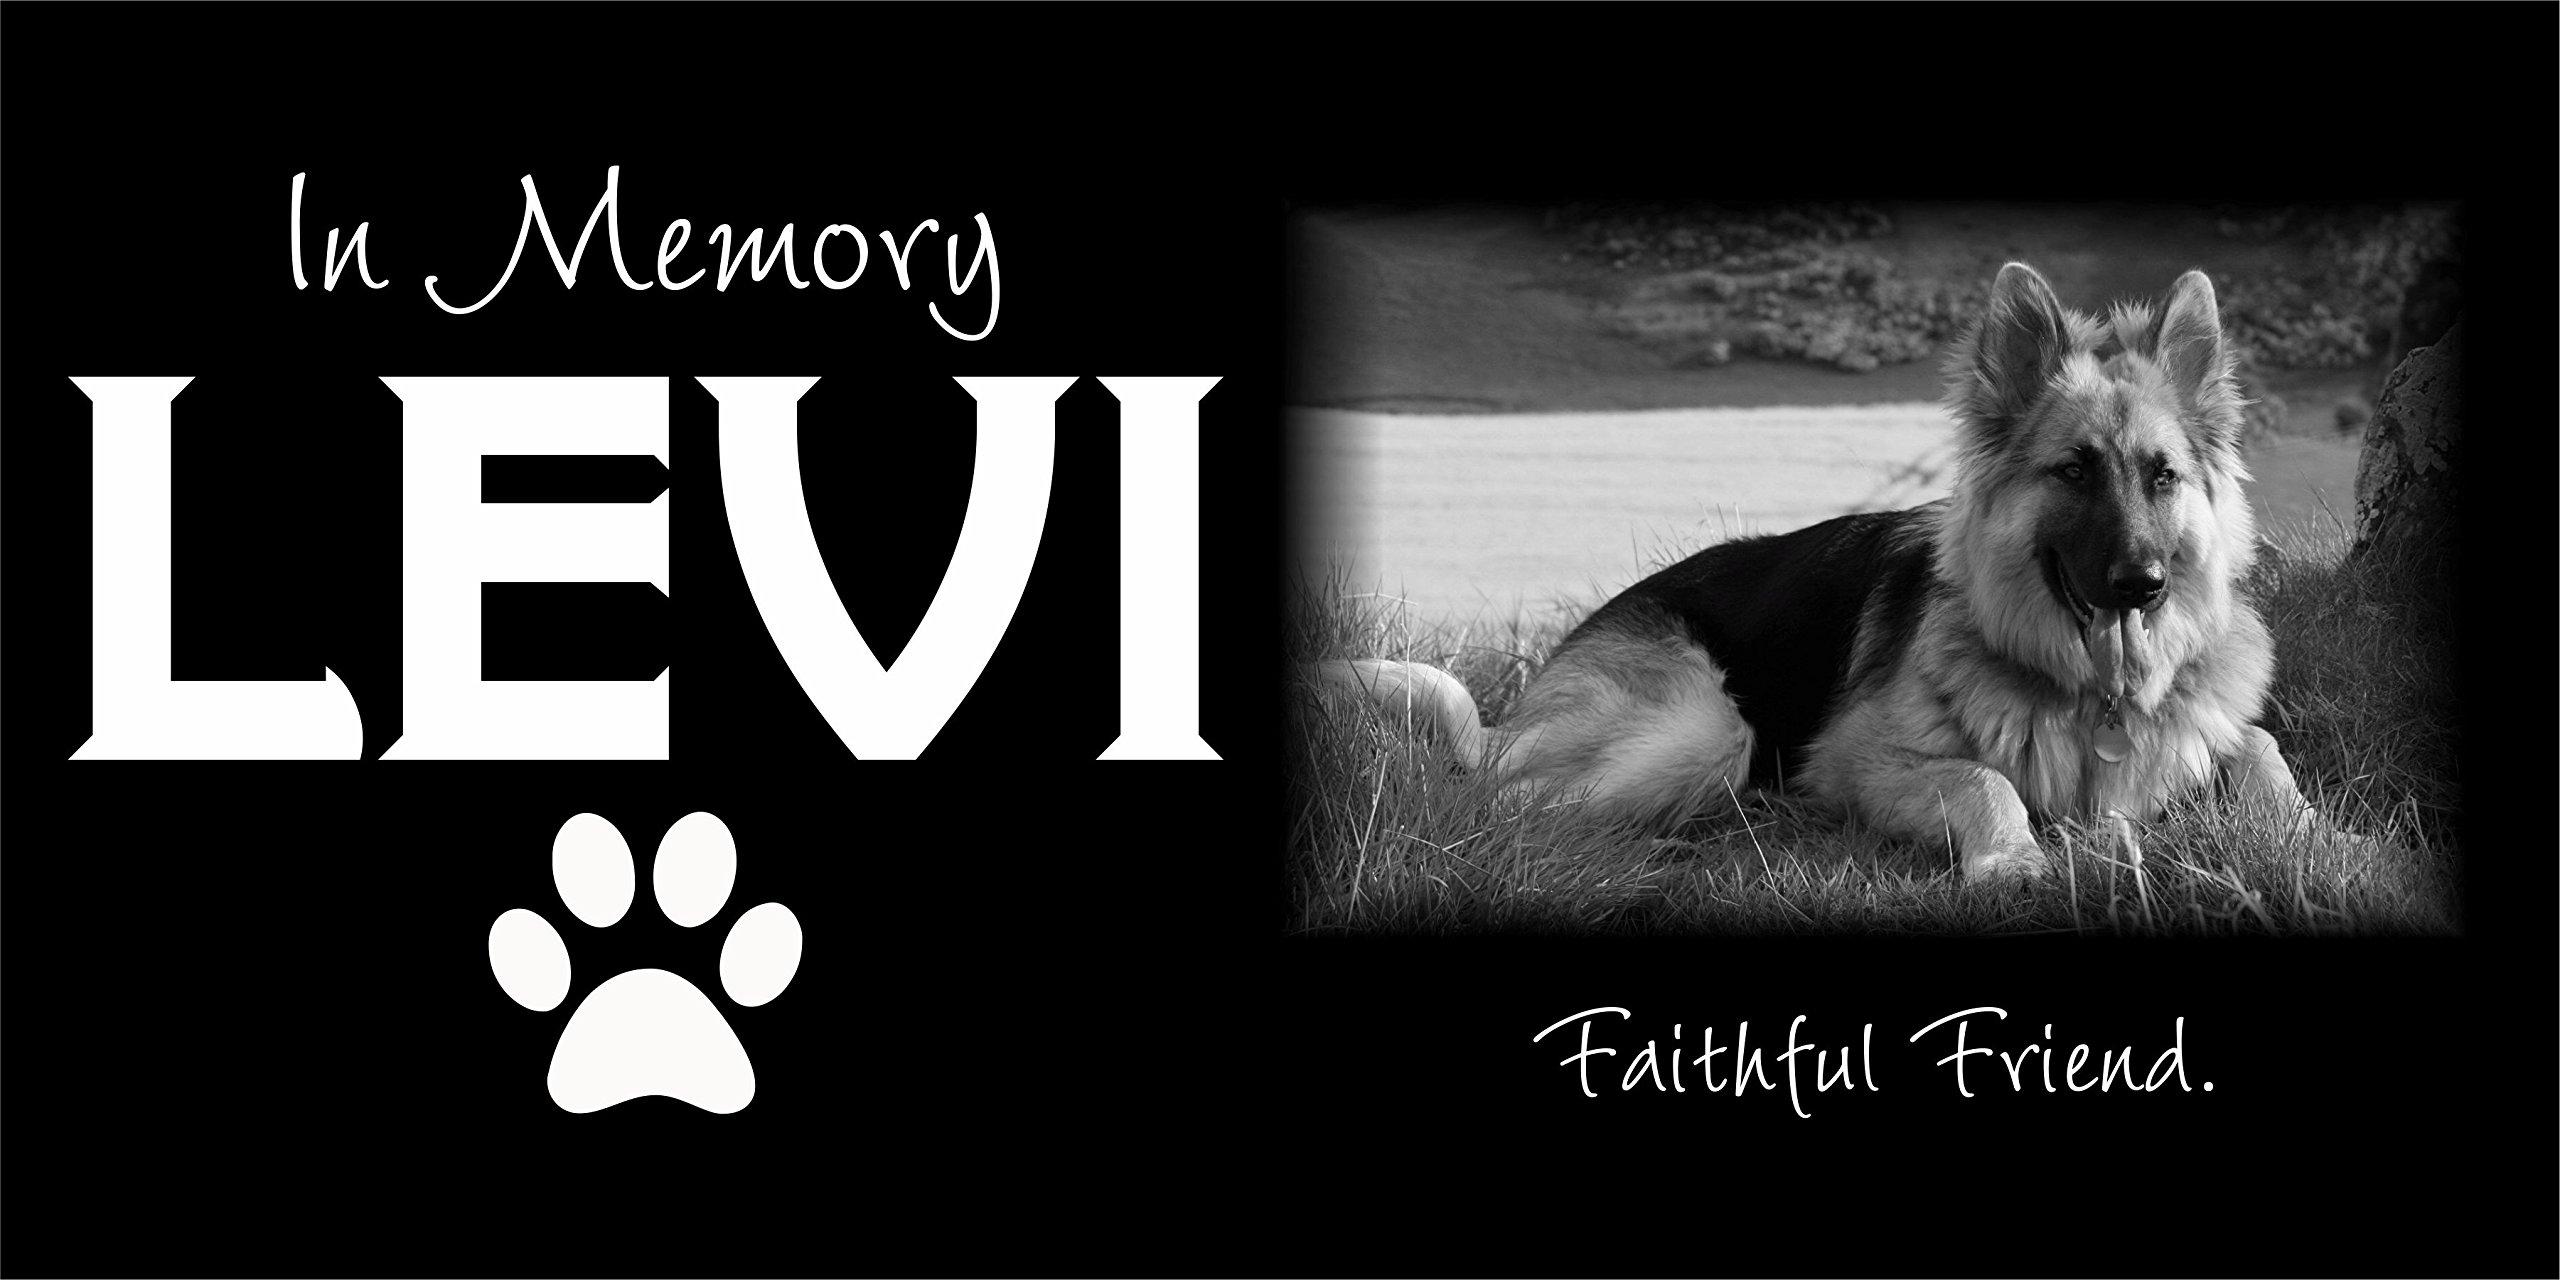 Custom Made Pet Stone Memorial Marker Granite Marker Dog Cat Horse Bird Human 6'' X 12'' Personalized German Shepherd Personalised